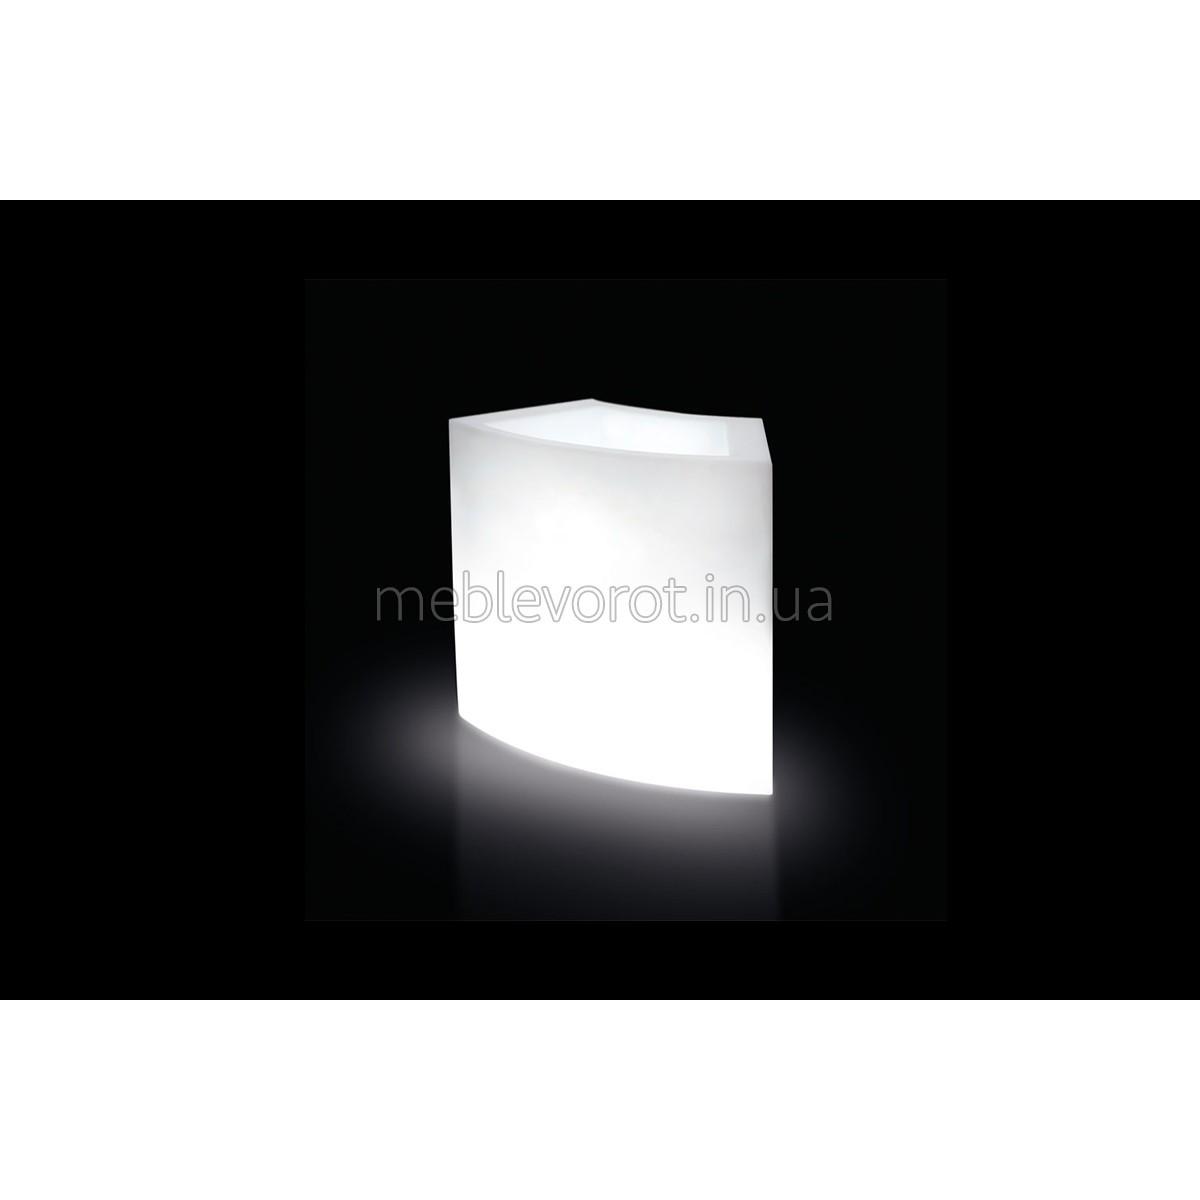 LED Айс Бар (Аренда)